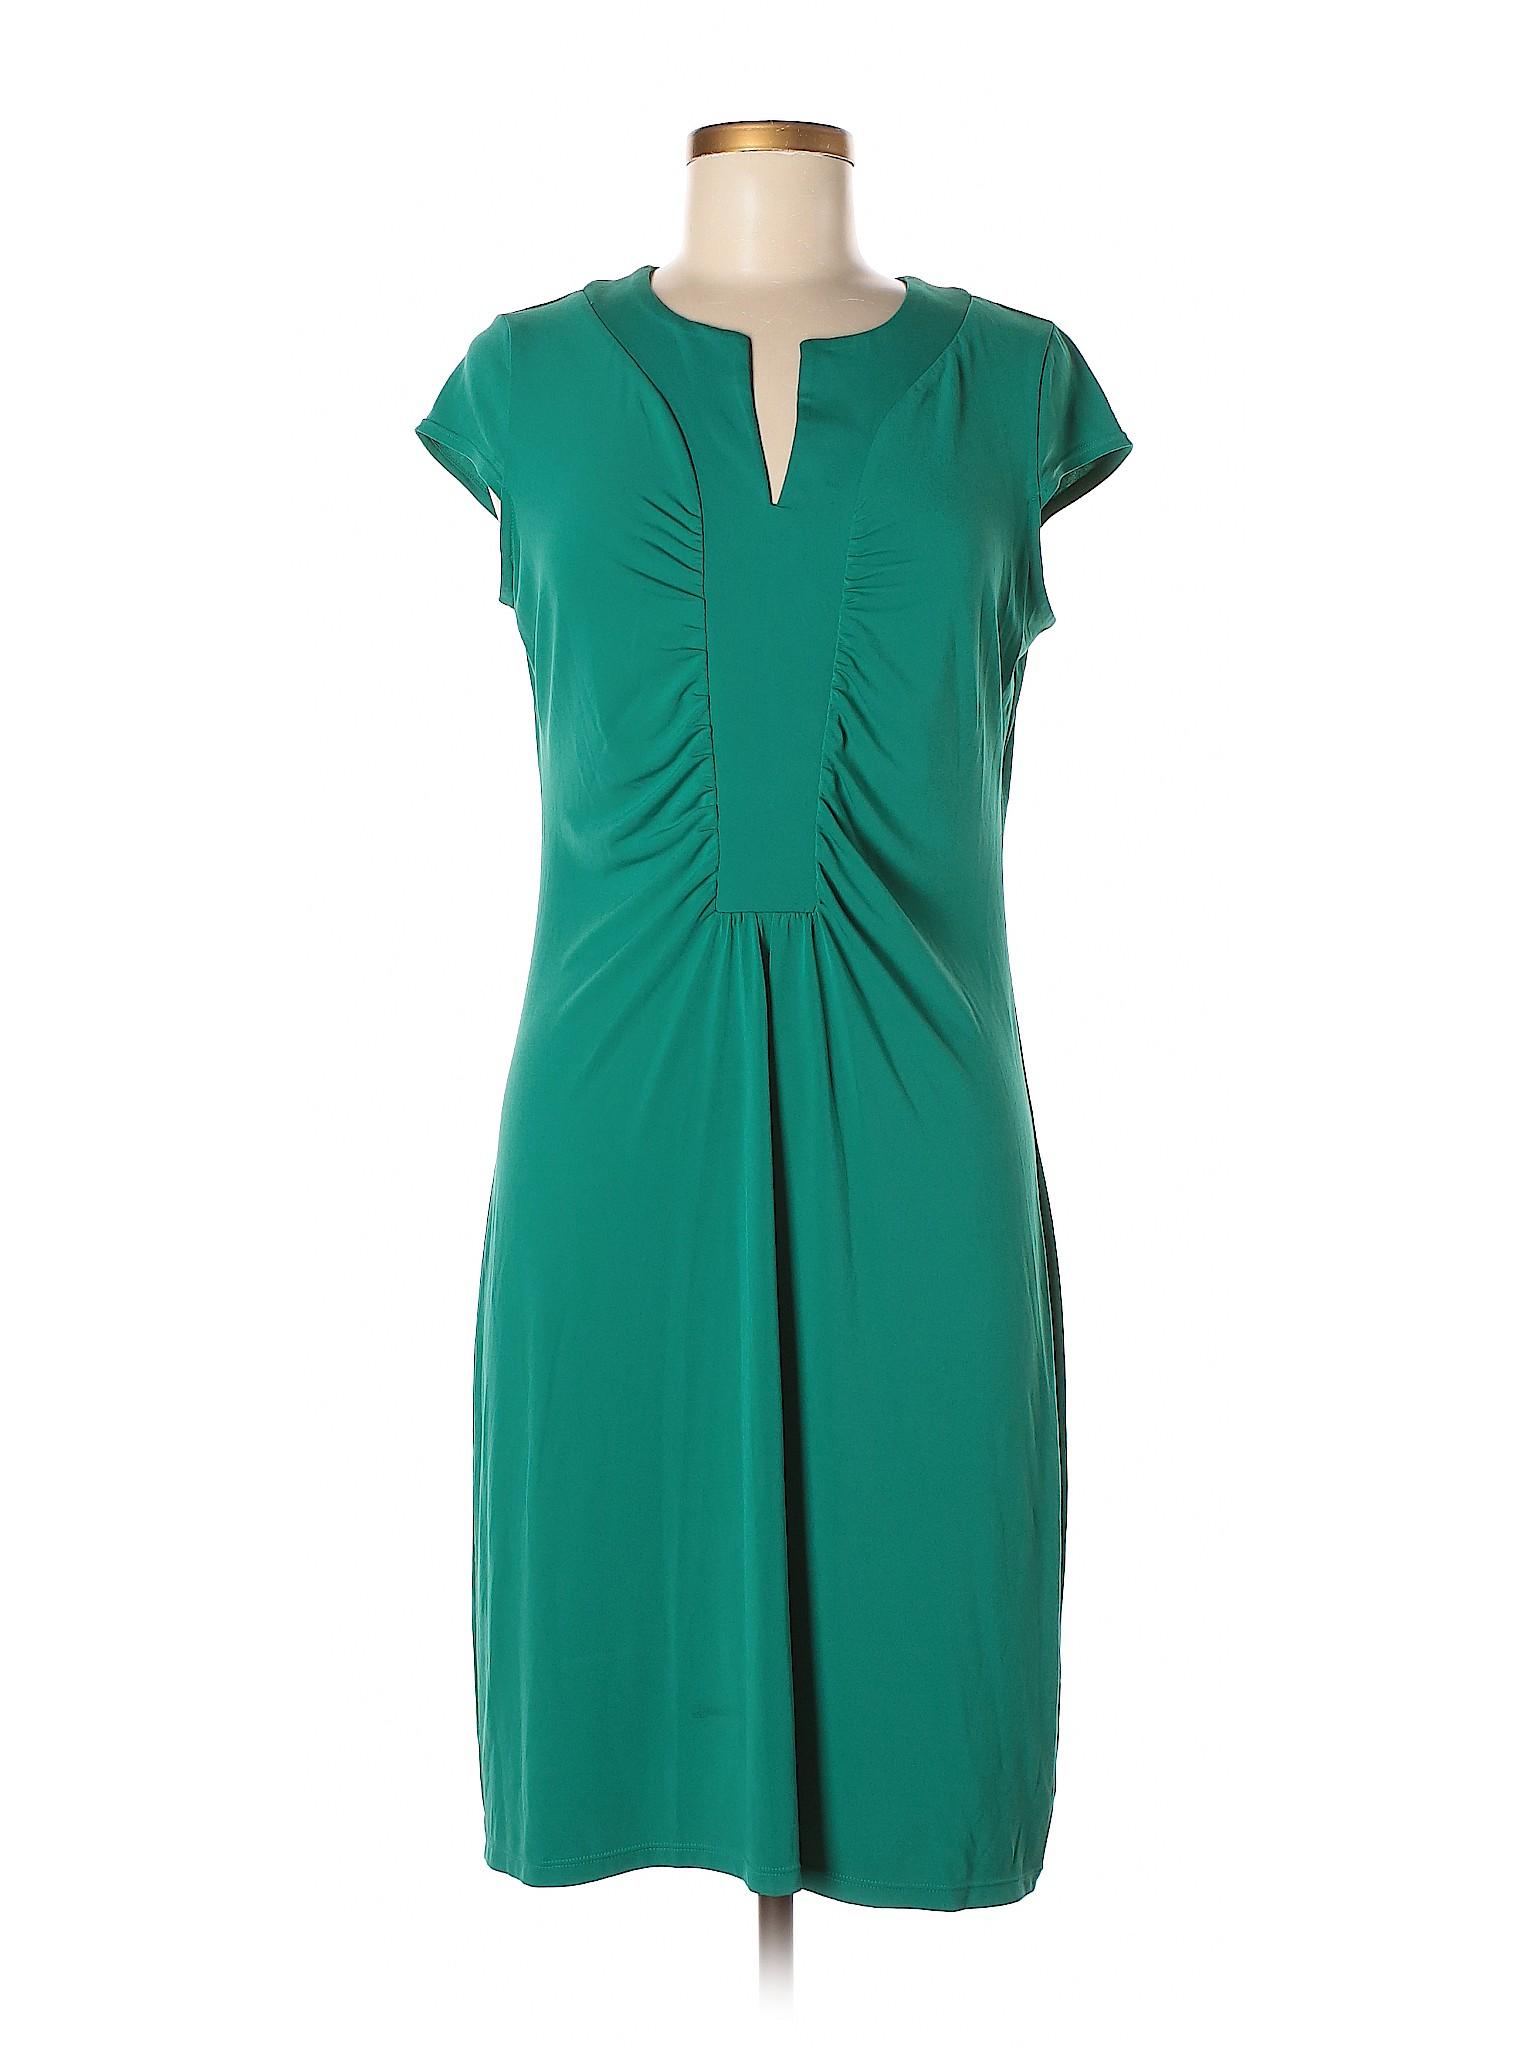 Alfani Casual Dress Alfani Selling Dress Casual Alfani Selling Selling Dress Casual aY6xqw4